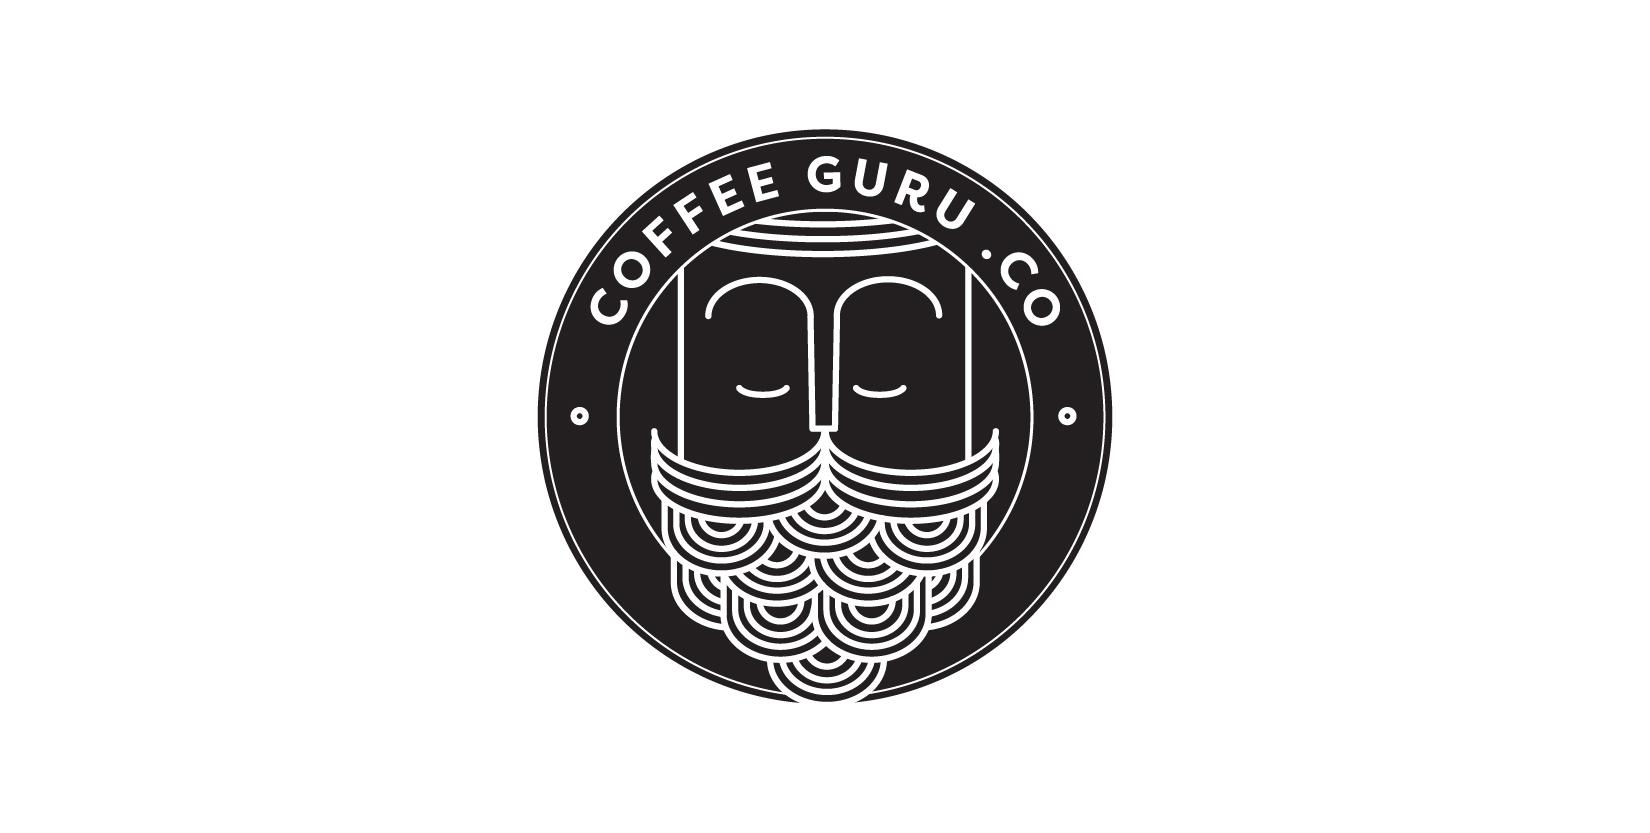 StephNE_LogoPortfolio_Coffee Guru 5.jpg